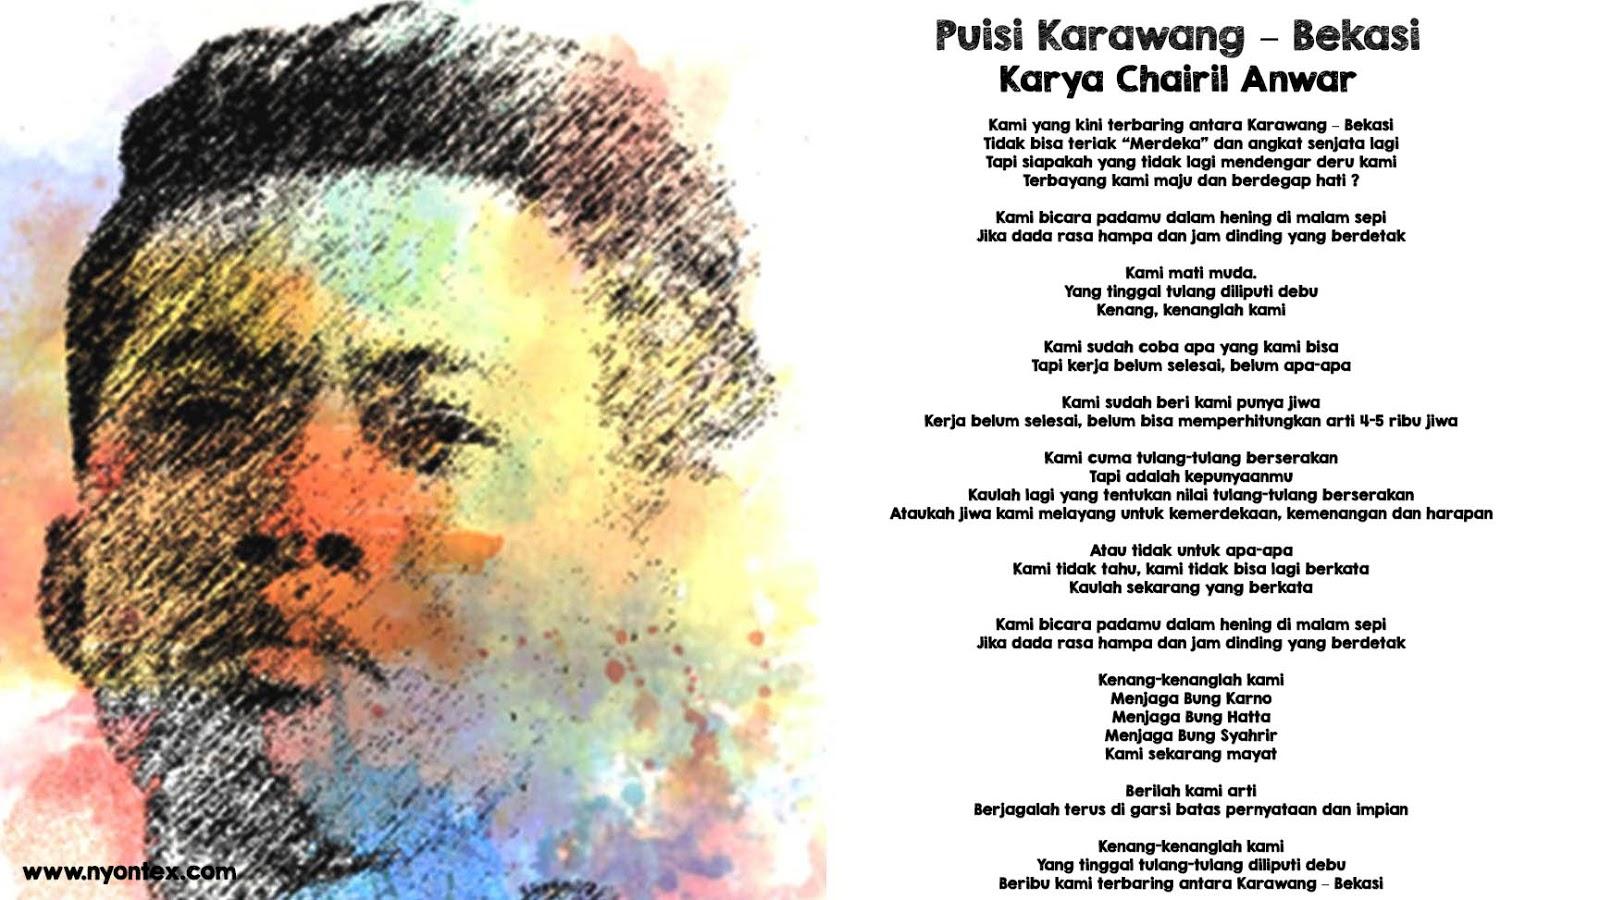 Puisi Karawang – Bekasi Karya Chairil Anwar